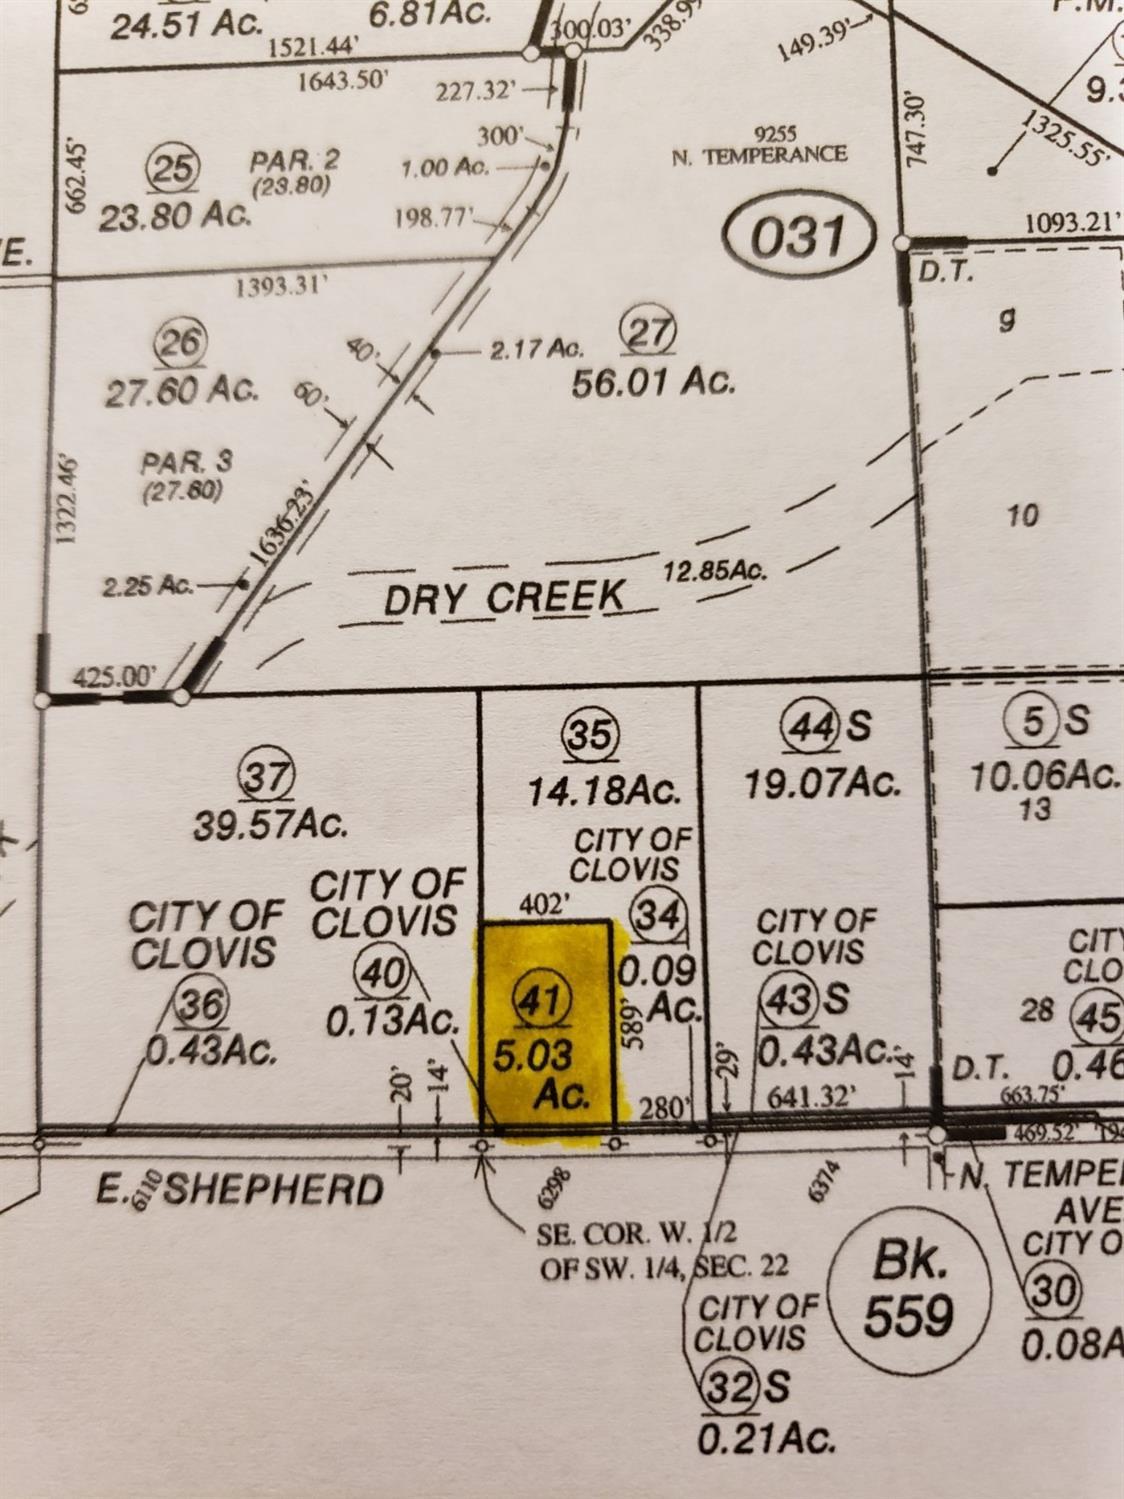 6298 E Shepherd Avenue, Clovis, CA 93619 | Mark and Sharon